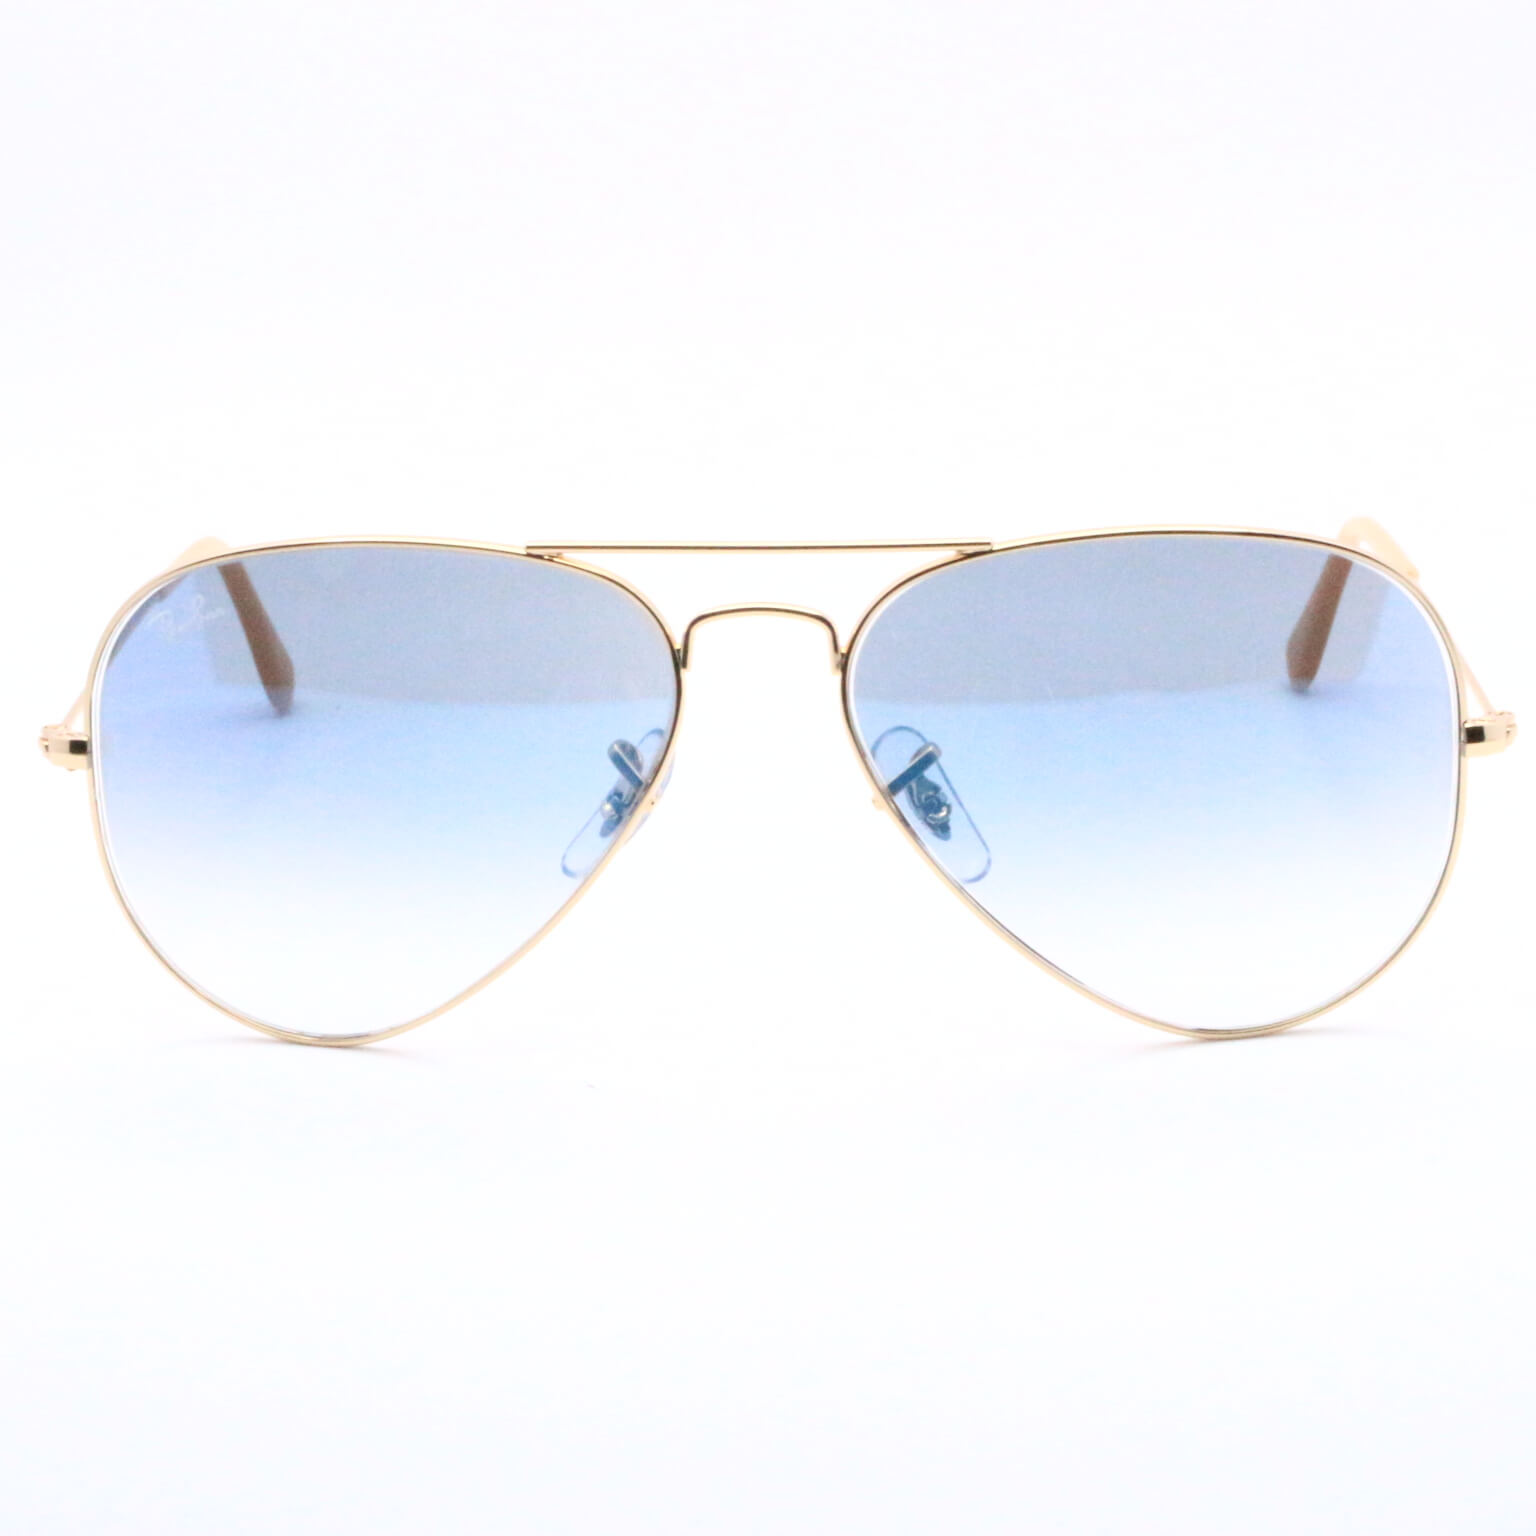 4217fbcfd7 Γυαλιά ηλίου Ray-Ban 3025 001 3F 58 ~ Οπτικά Eyelab